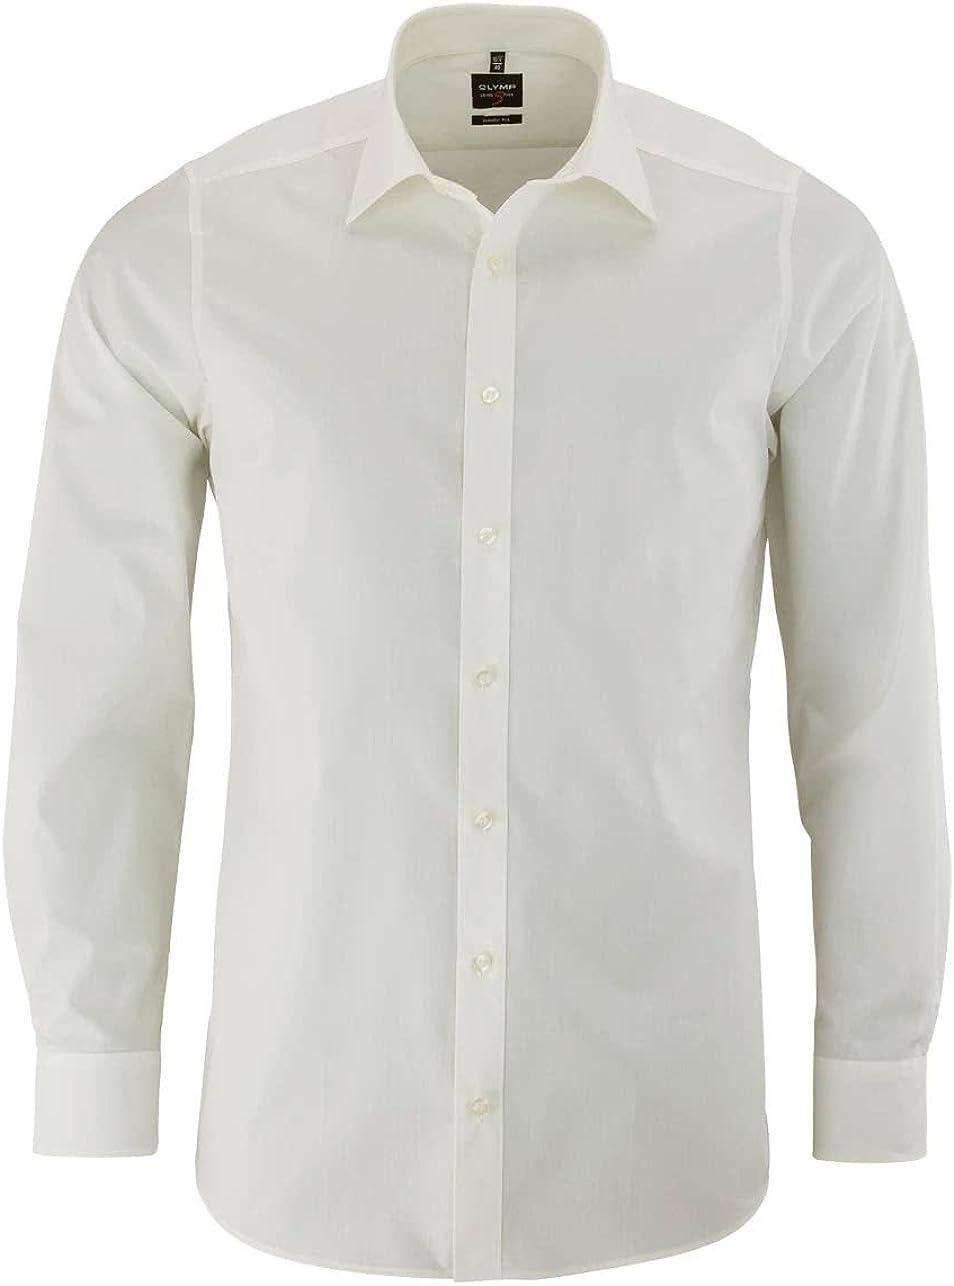 Camiseta de manga larga de Olymp de corte moderno con cuello New Kent